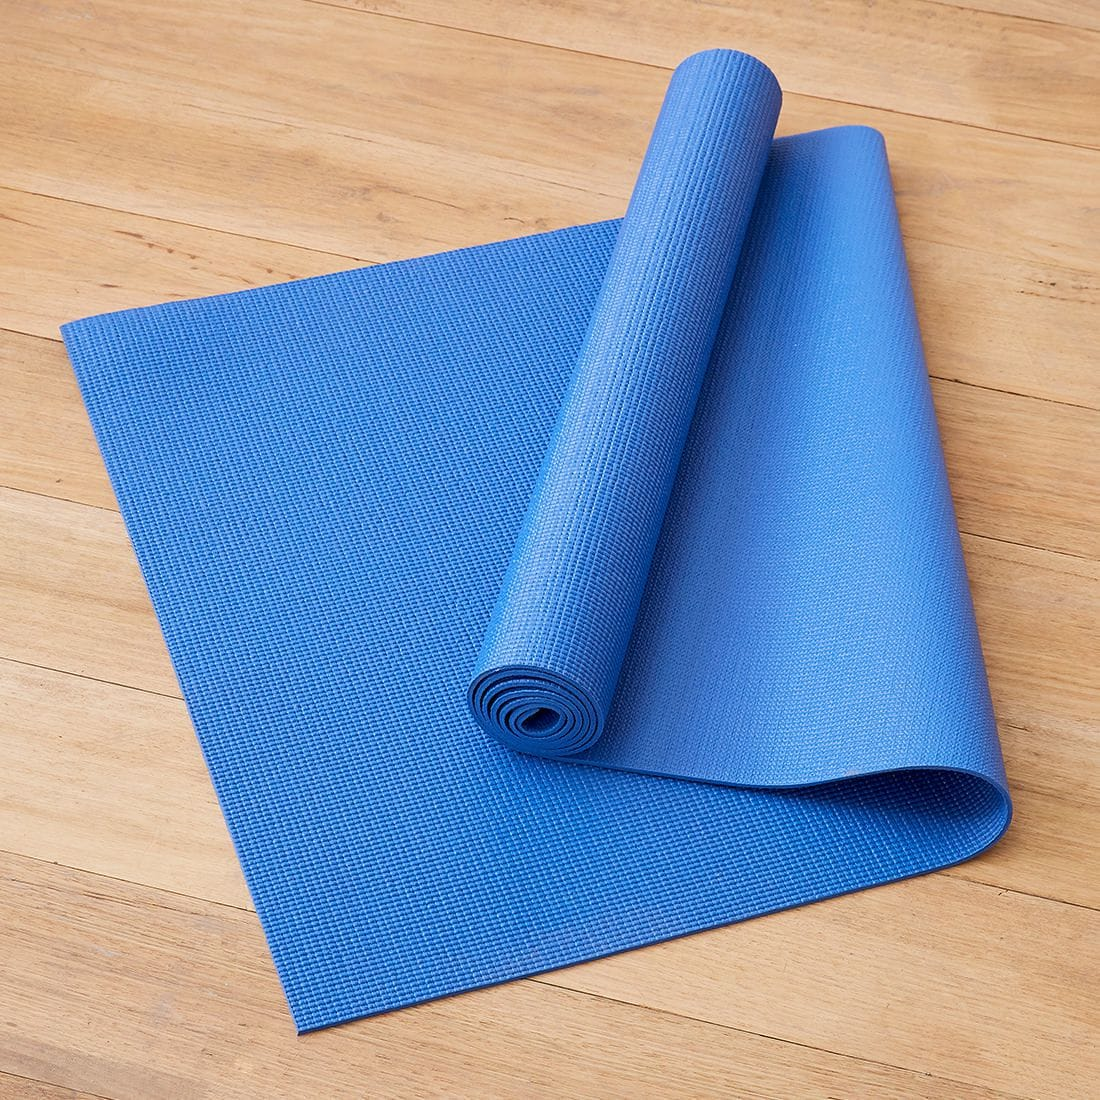 Yoga mat and ball clipart jpg transparent Yoga Mat Assorted jpg transparent